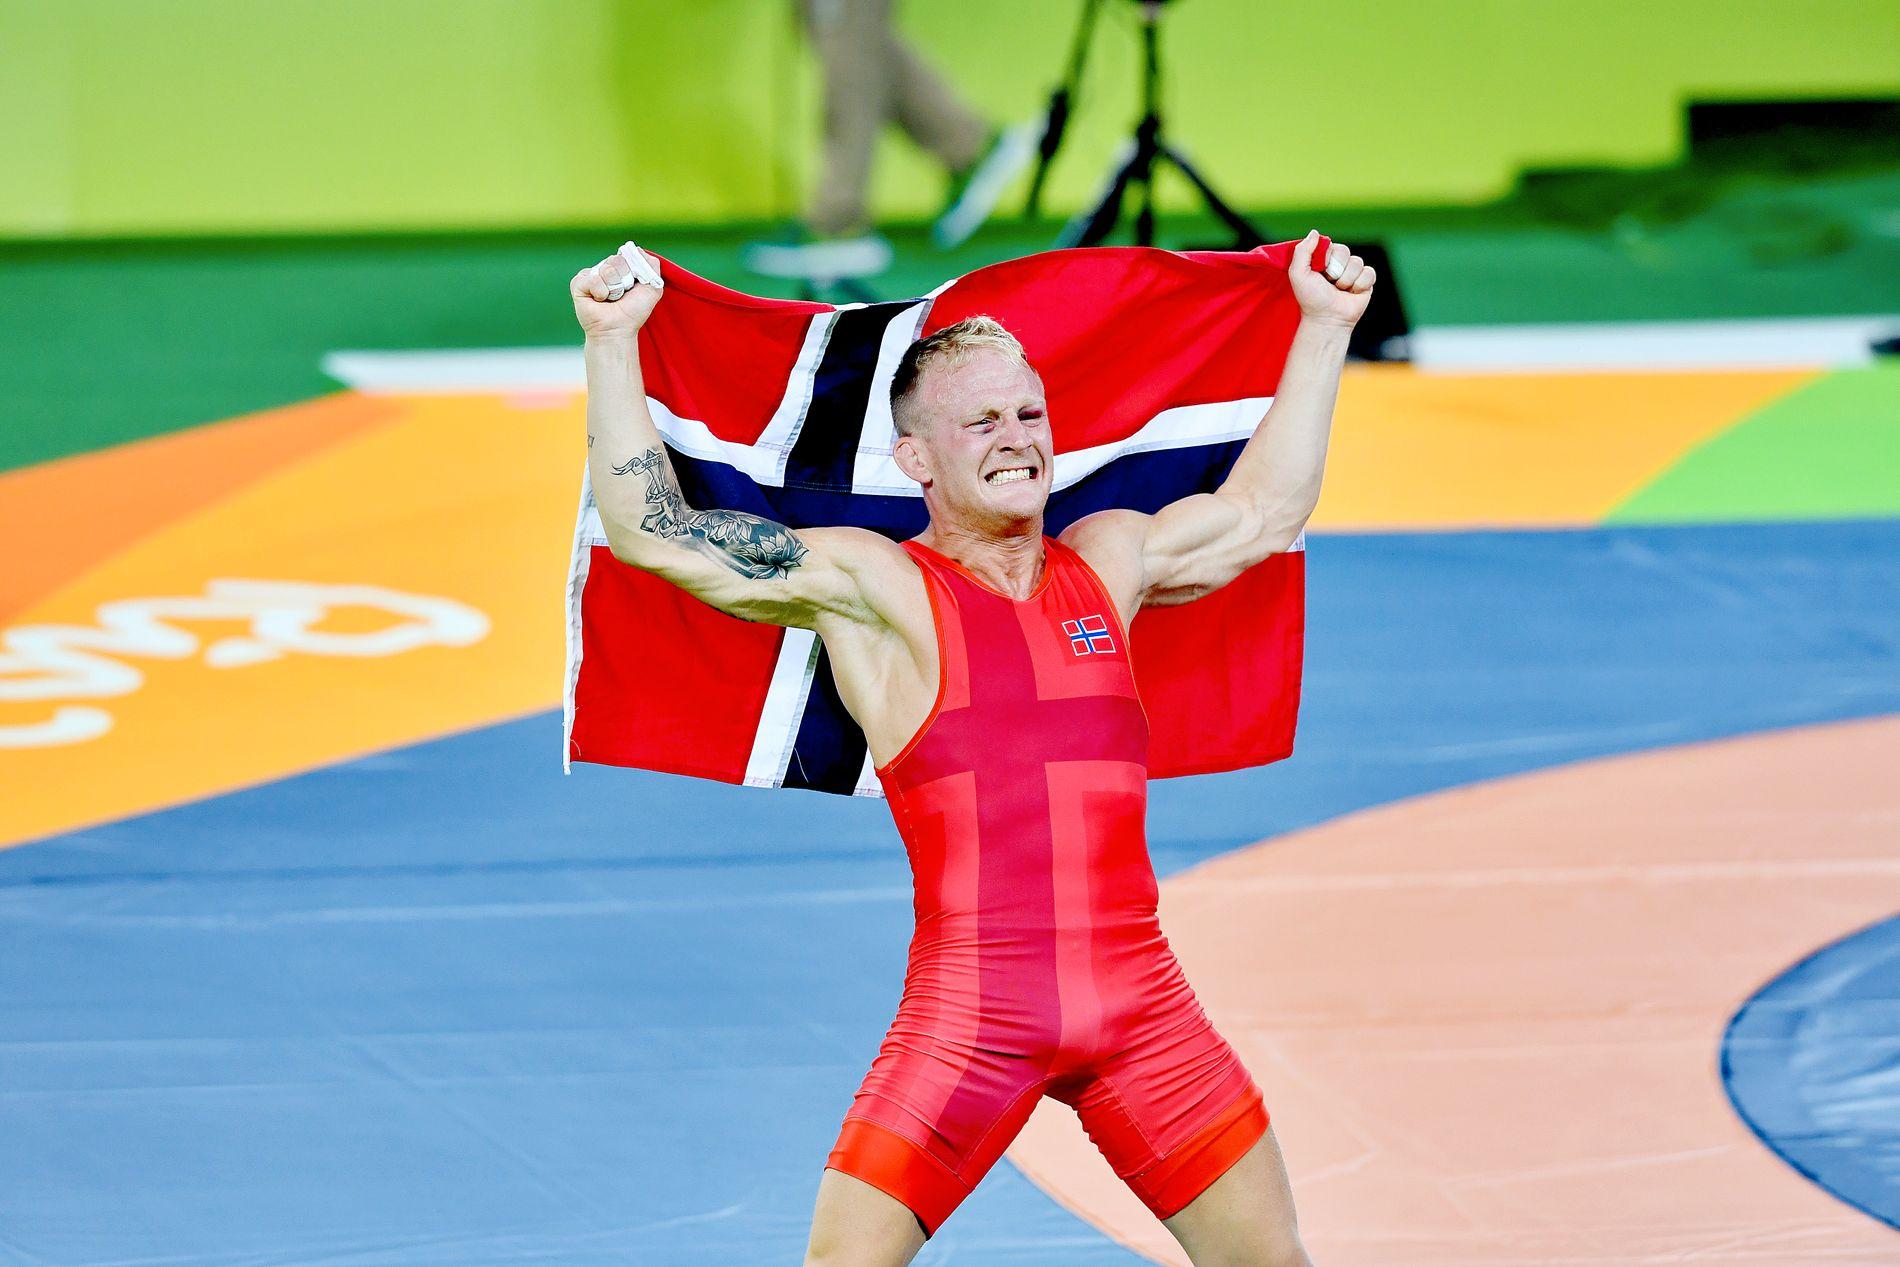 OL-BRAGDEN: Stig-André Berge jubler etter OL-bronsen i 59-kilosklassen i Rio for to år siden.